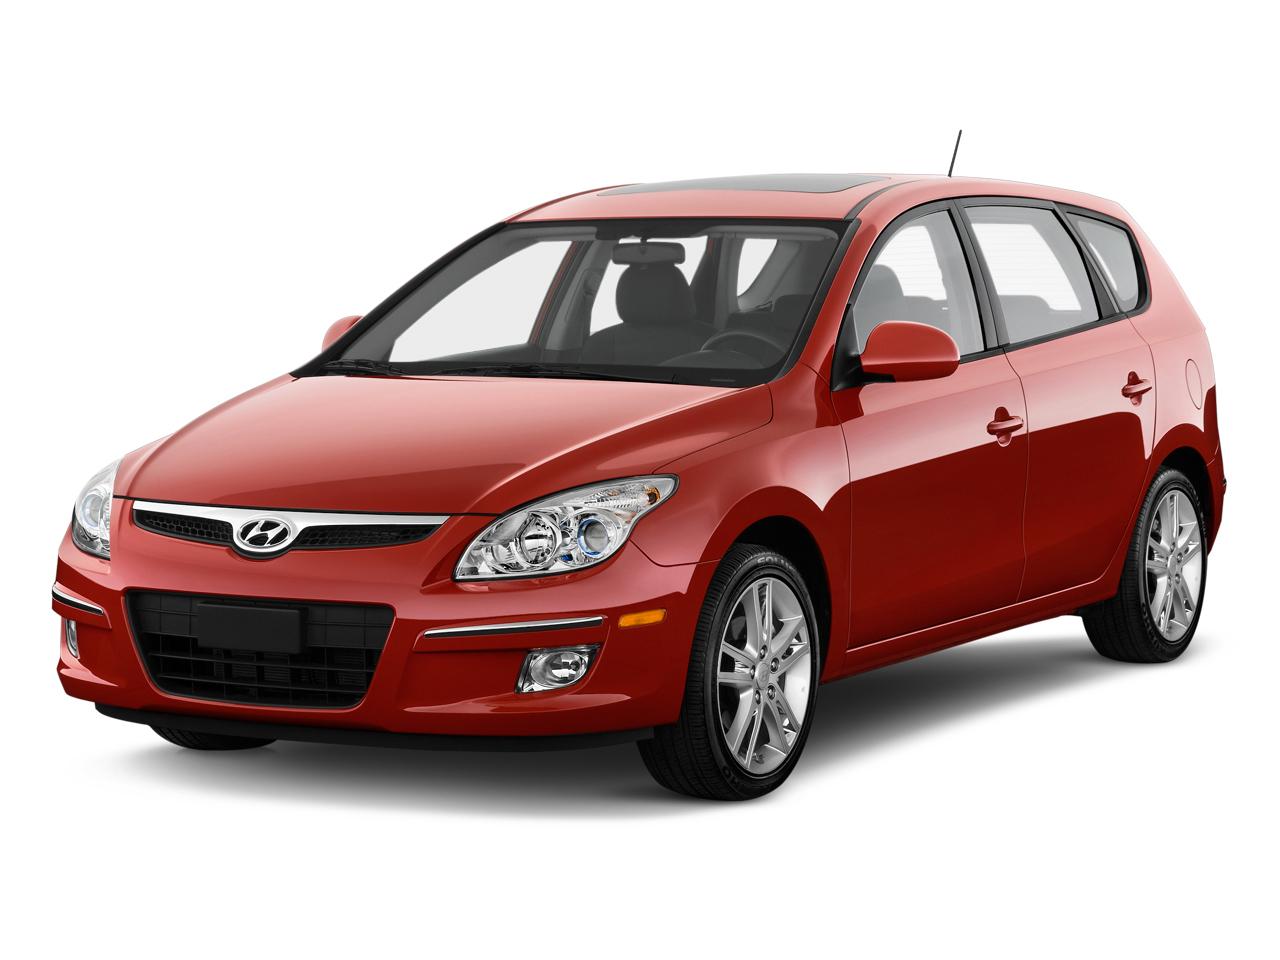 2011 Hyundai Elantra Touring Review Ratings Specs